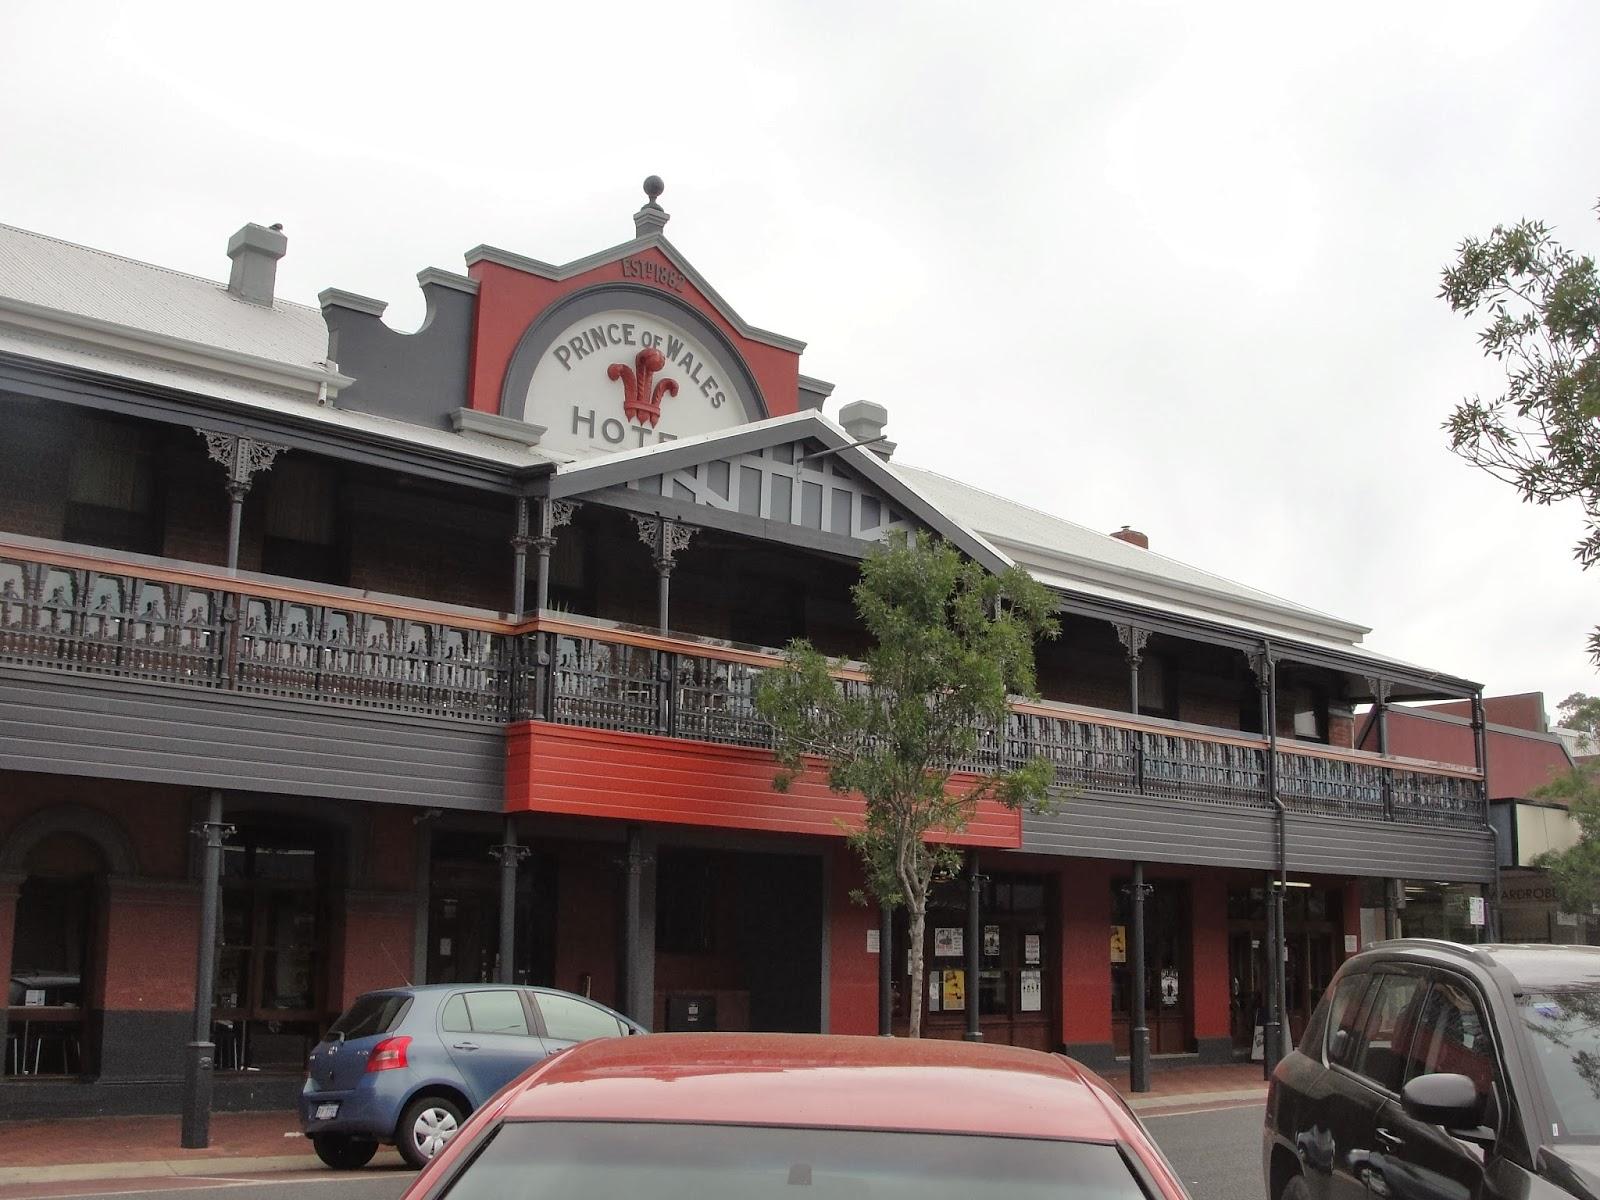 4 weeks away - First 12 days in Bunbury & Perth, WA | AWOL